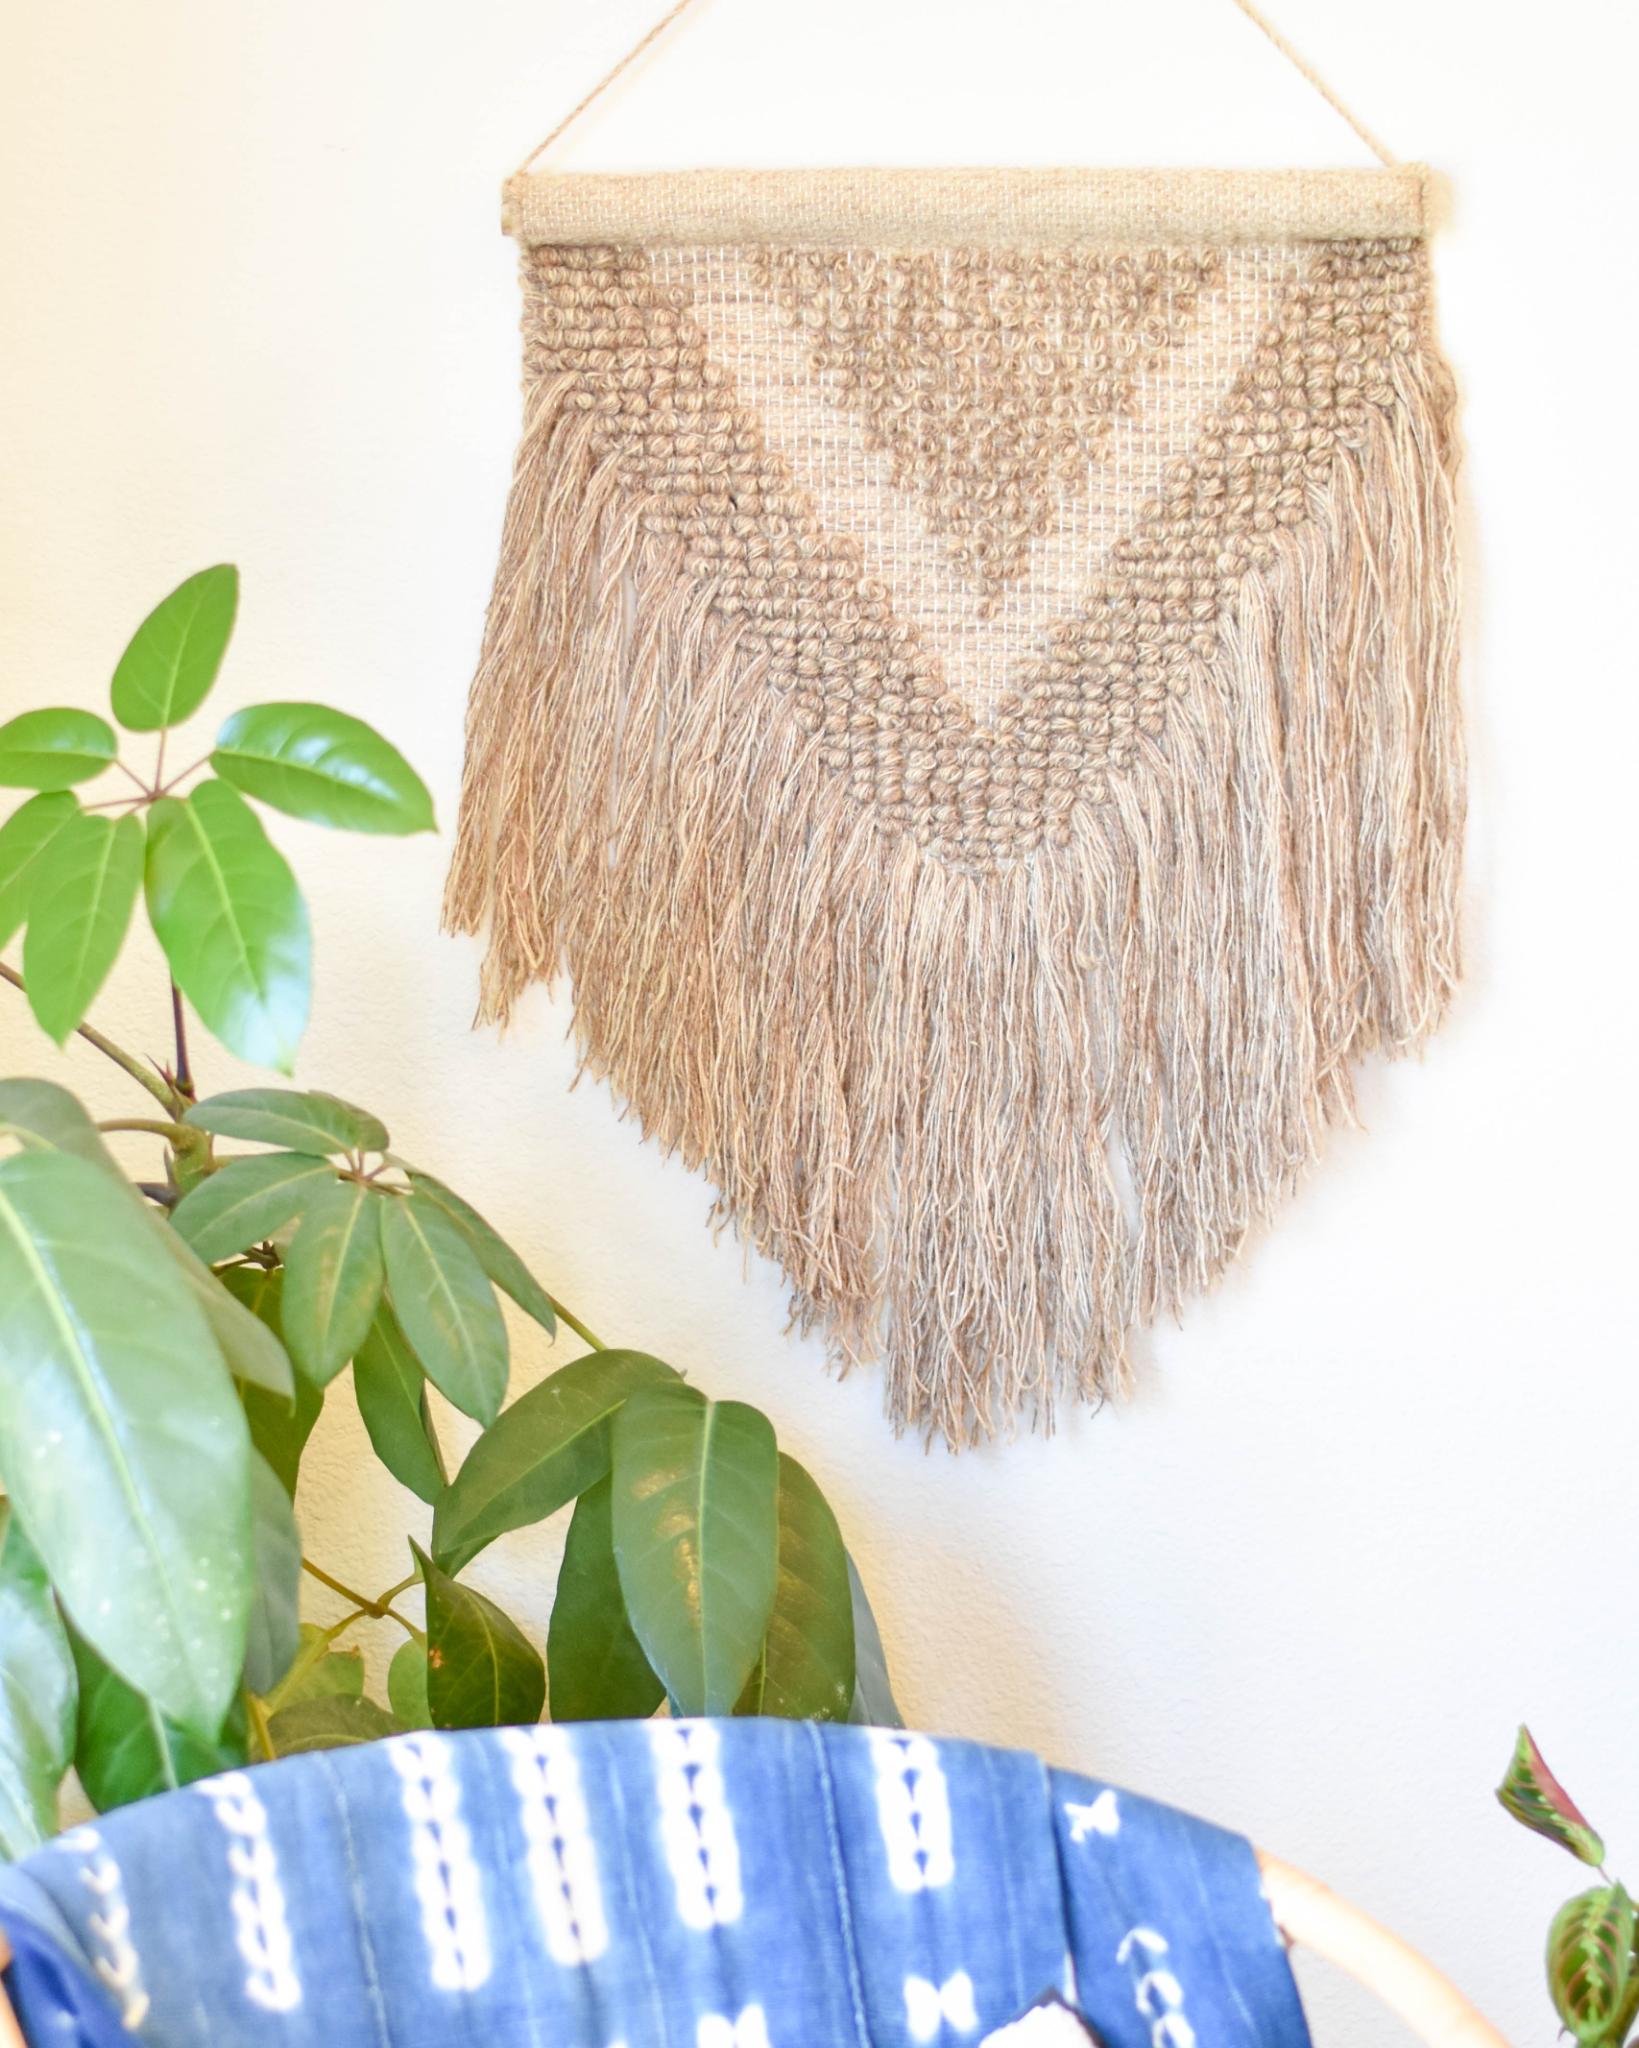 handmade wool wall hanging da8153 DANPXVGYMA6V0